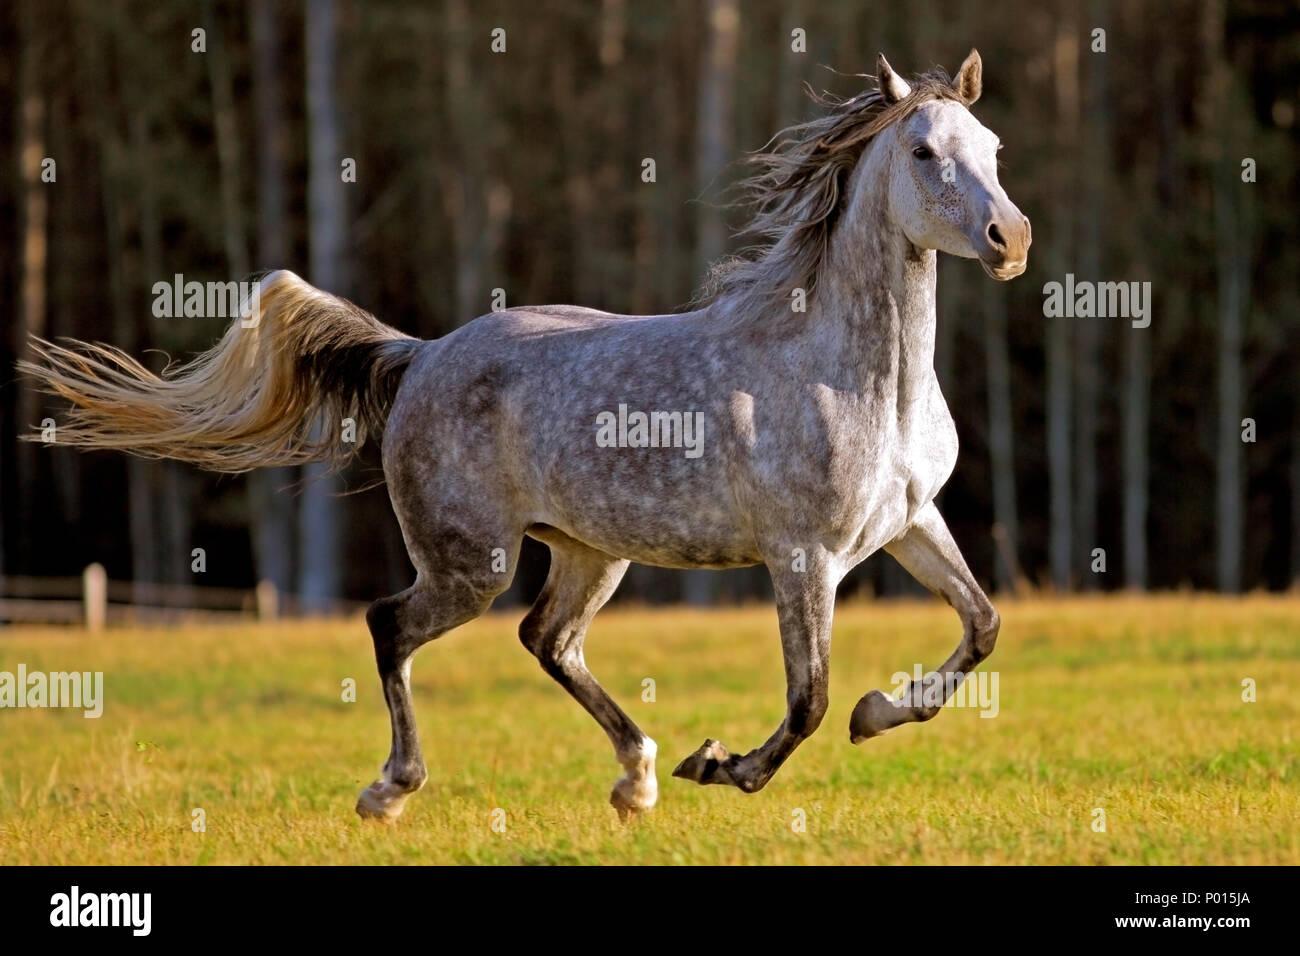 Beautiful gray dapple Arabian Mare galloping in meadow, late afternoon sunlight. - Stock Image